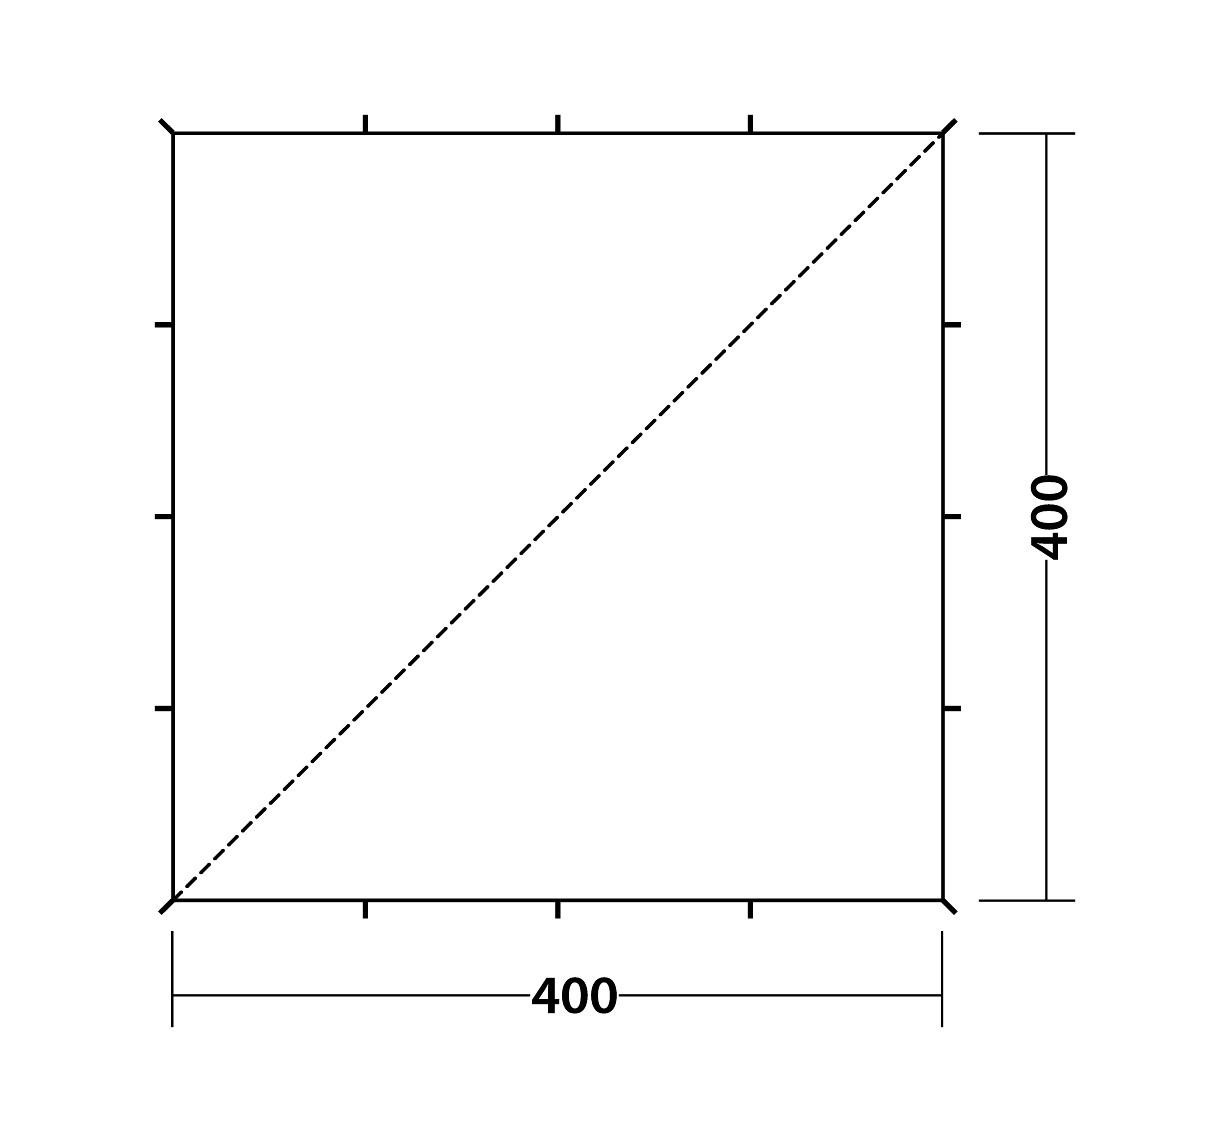 130041_Tarp 4 x 4 m_Drawing Floorplan3